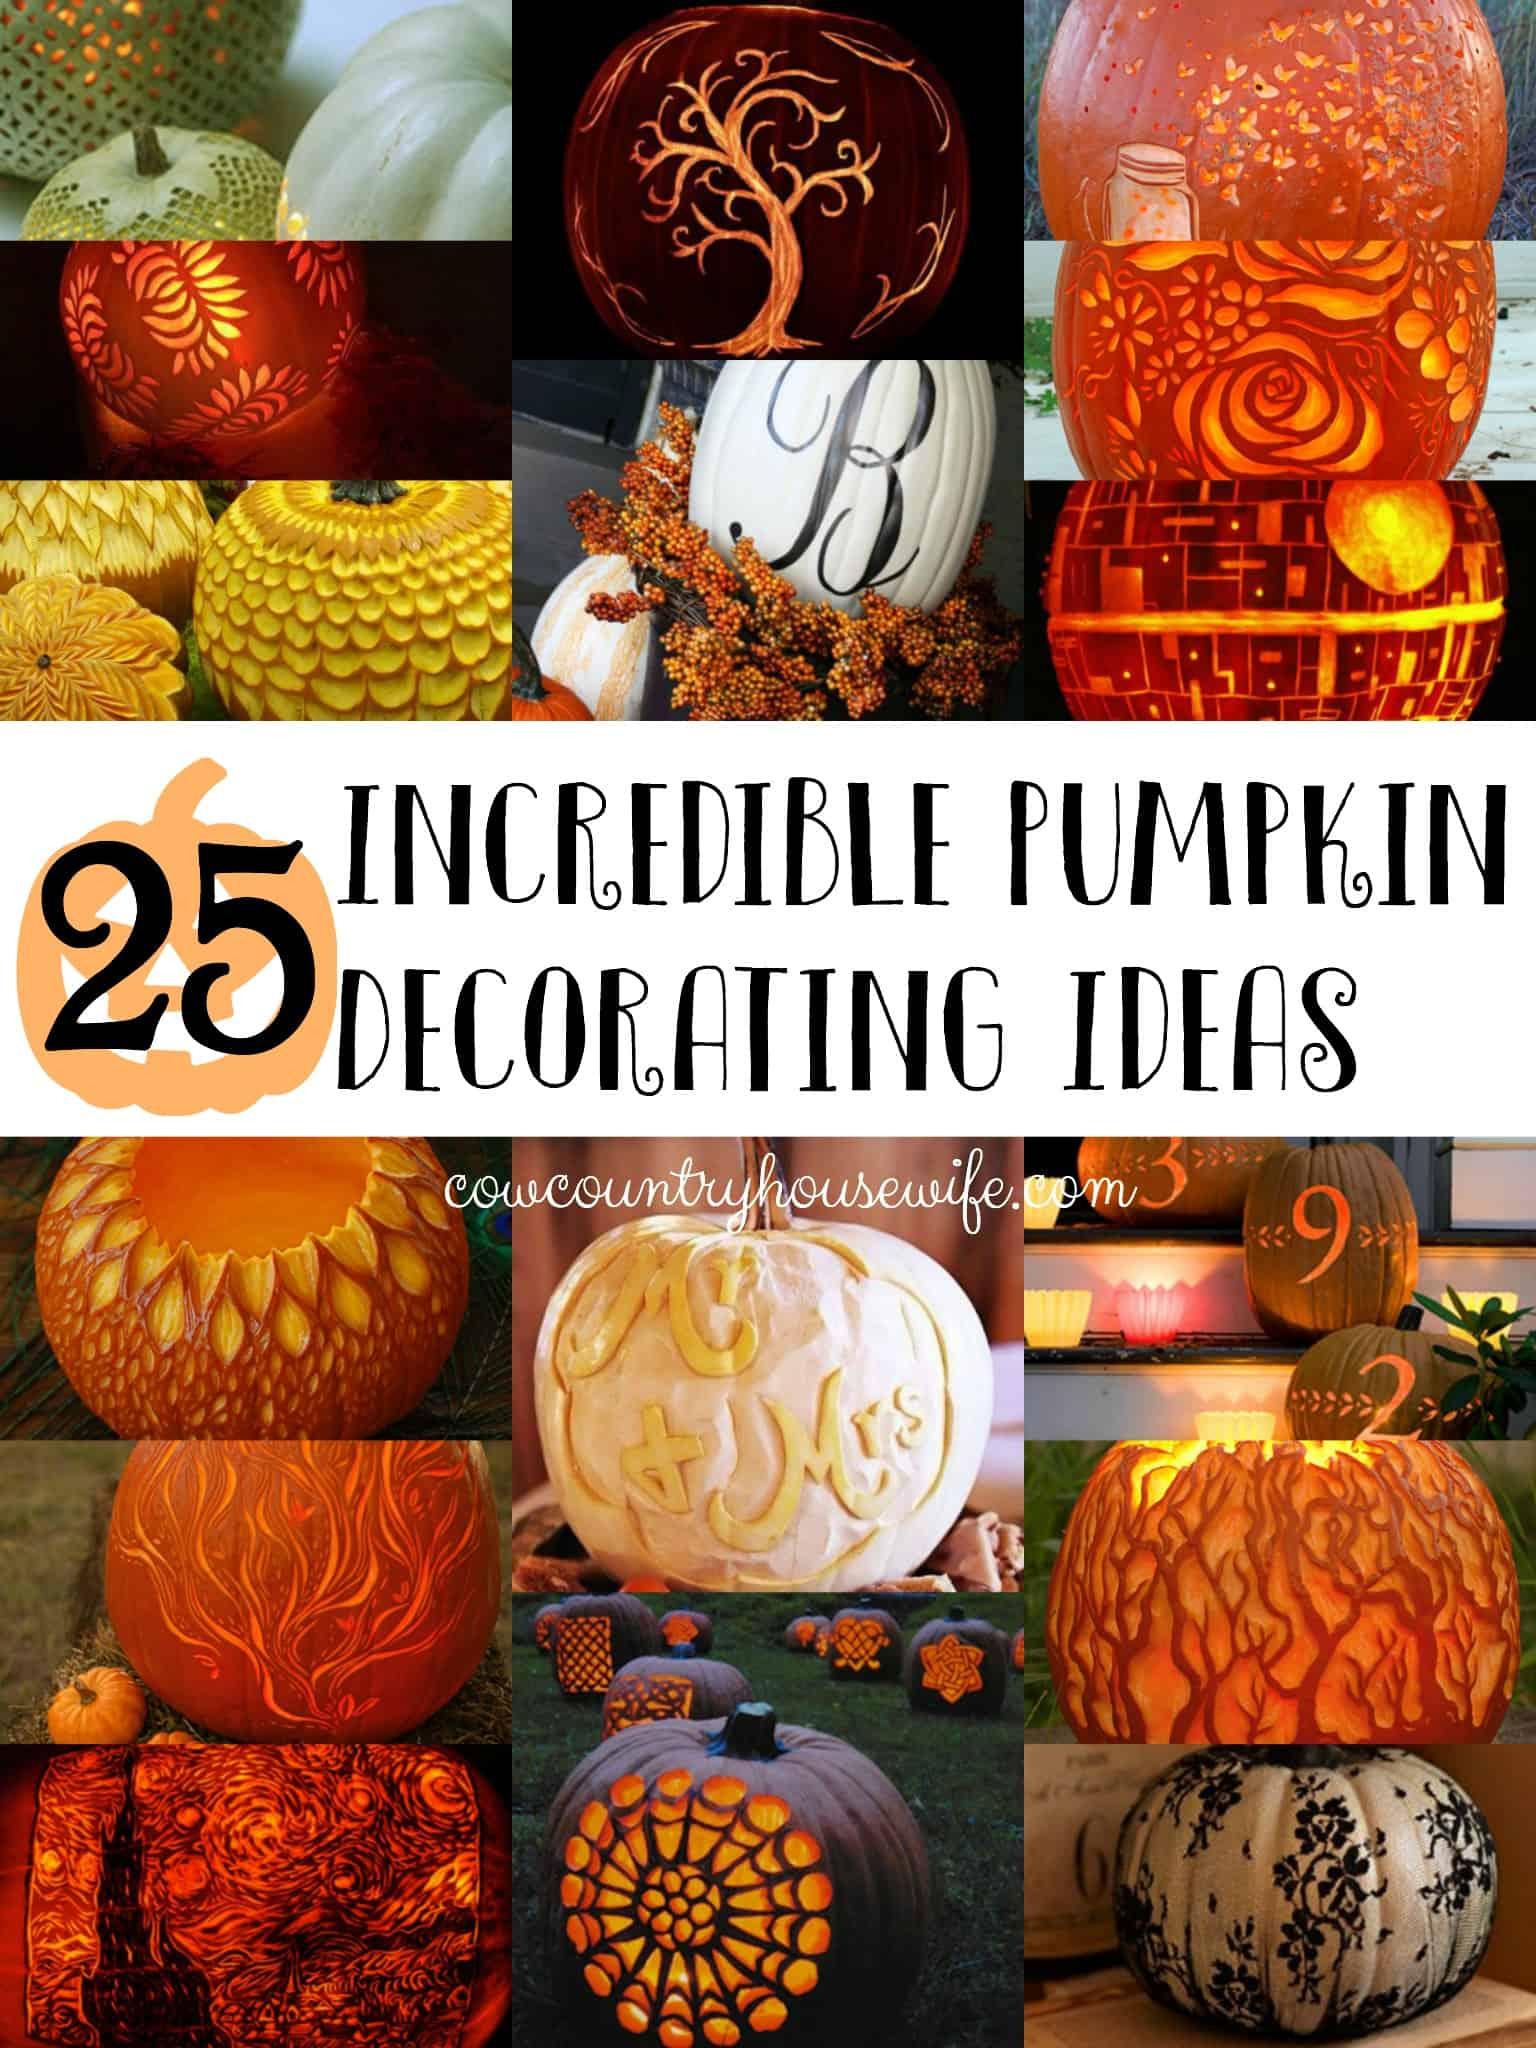 & 25 Incredible Pumpkin Decorating Ideas